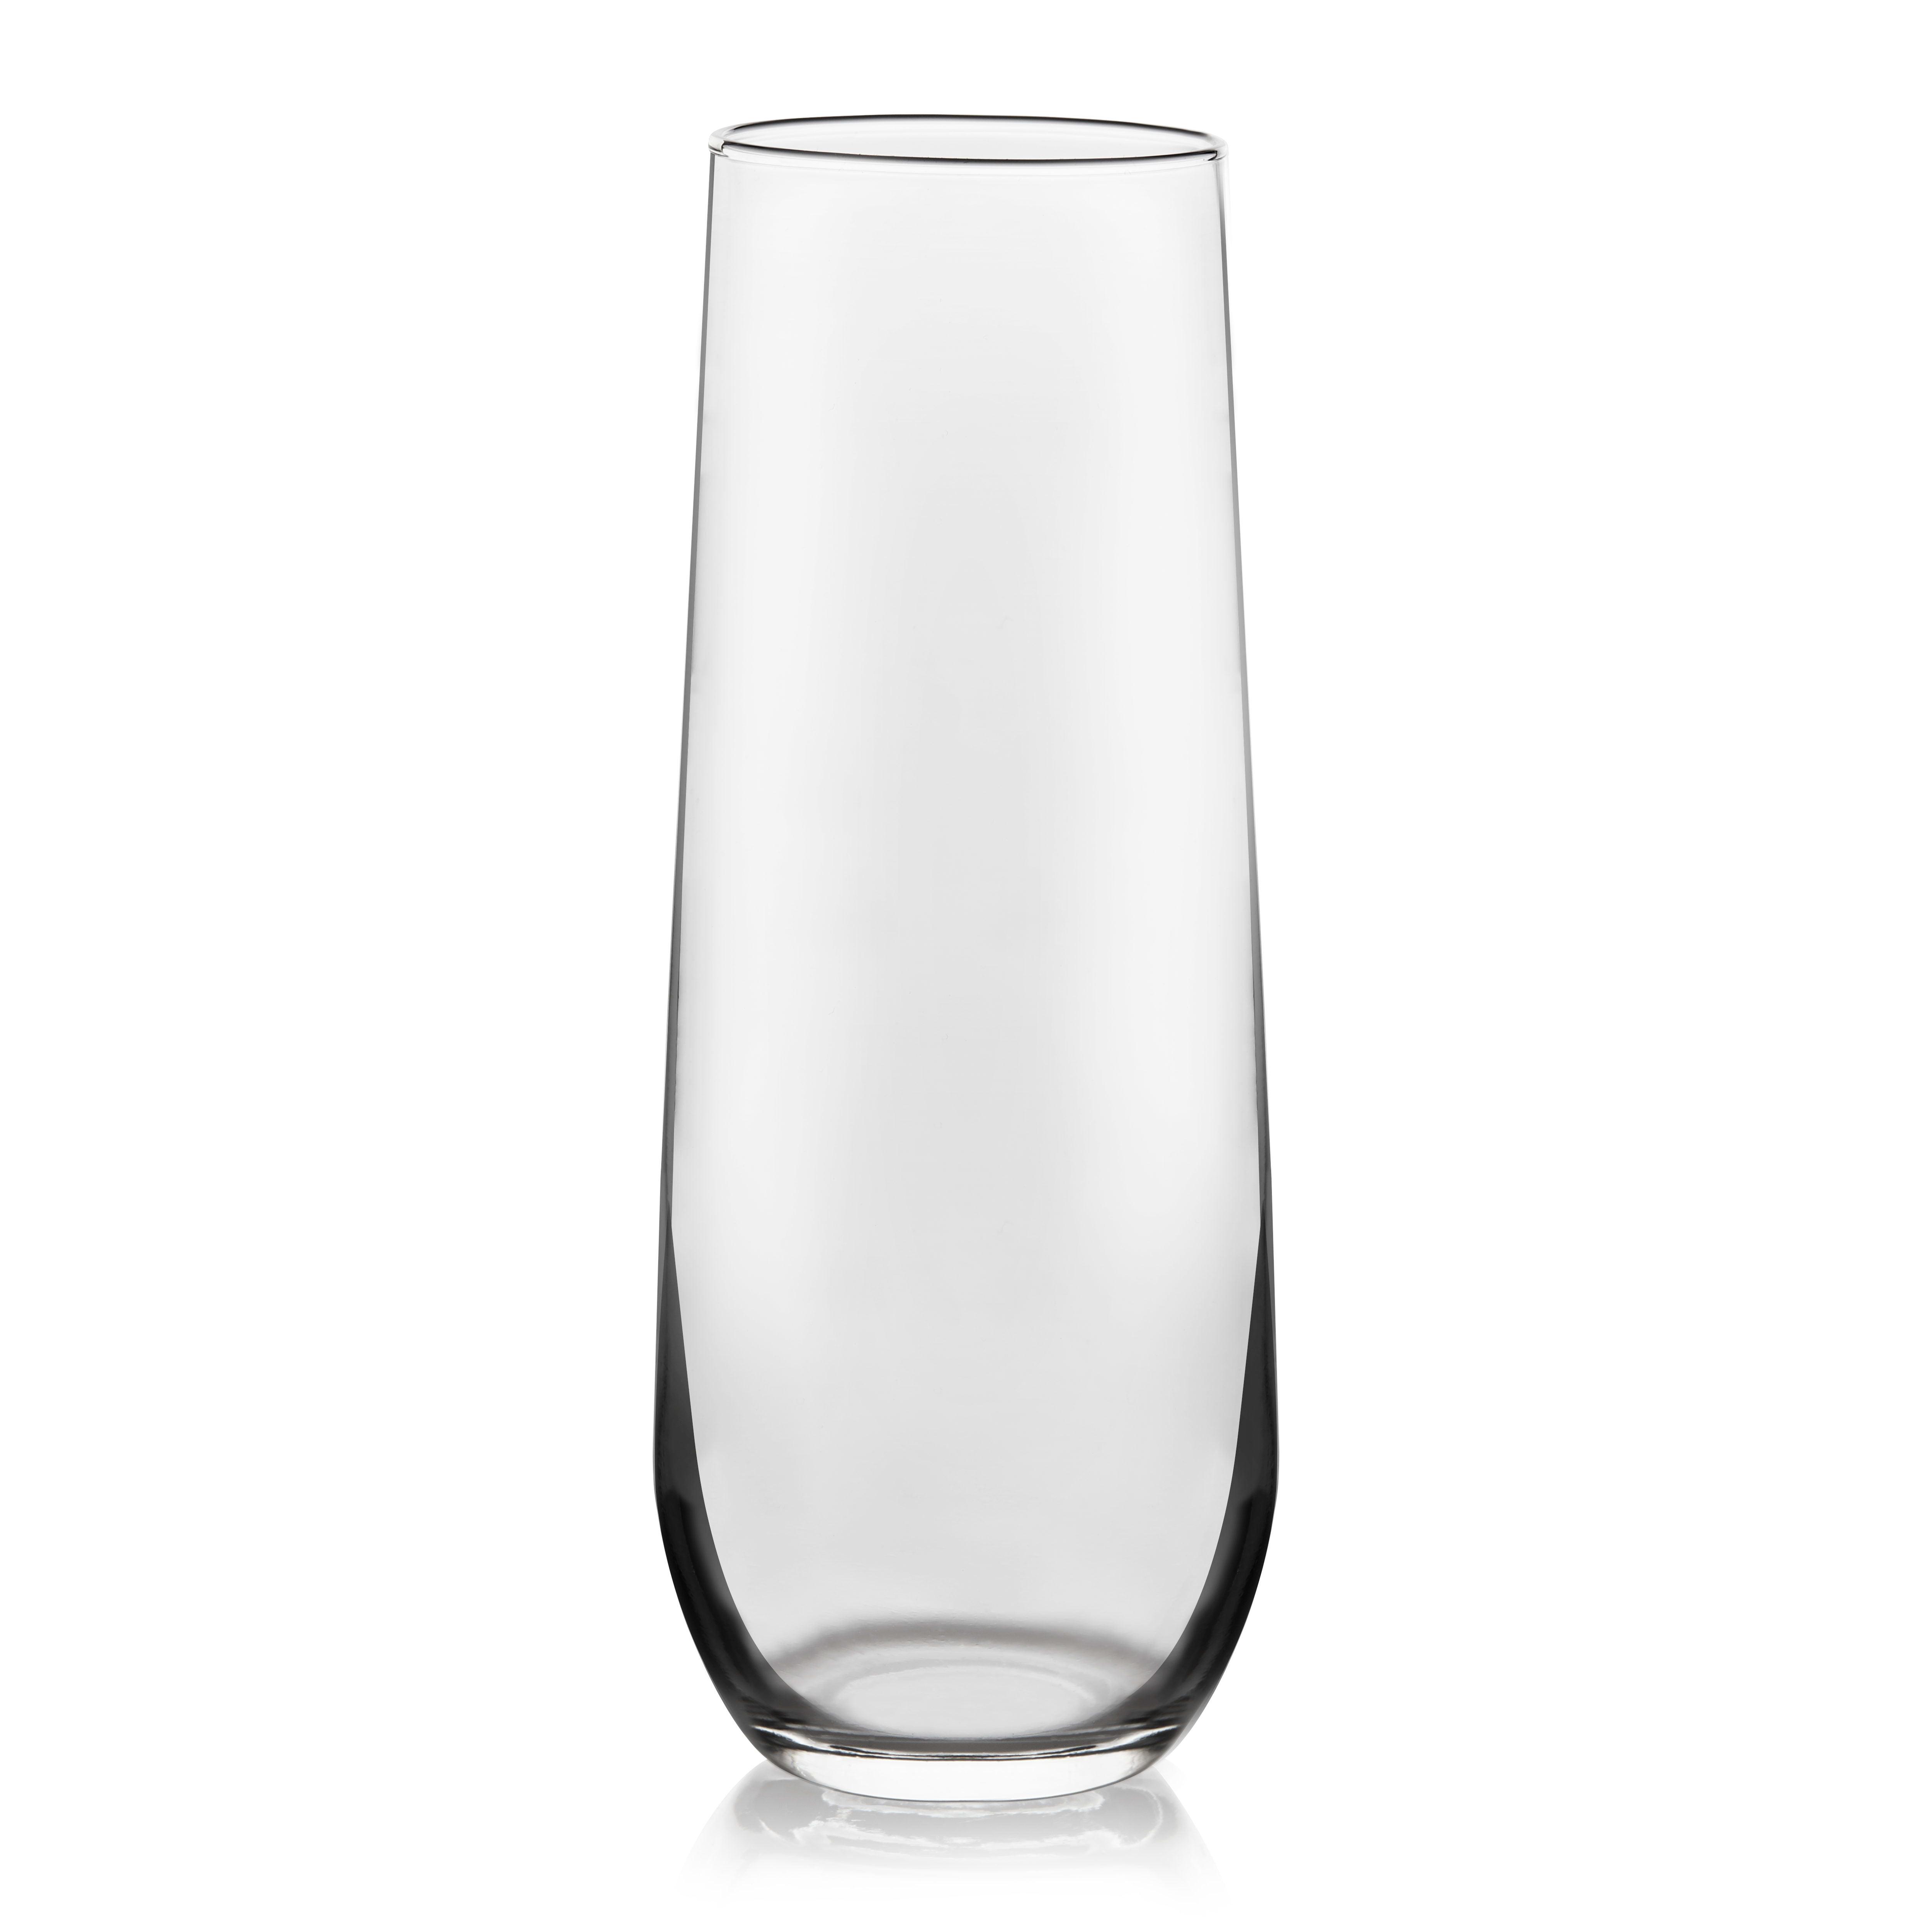 BLACK LABRADOR 2 TALL LONG SLIM DRINK HEAVEY BASE GLASSES